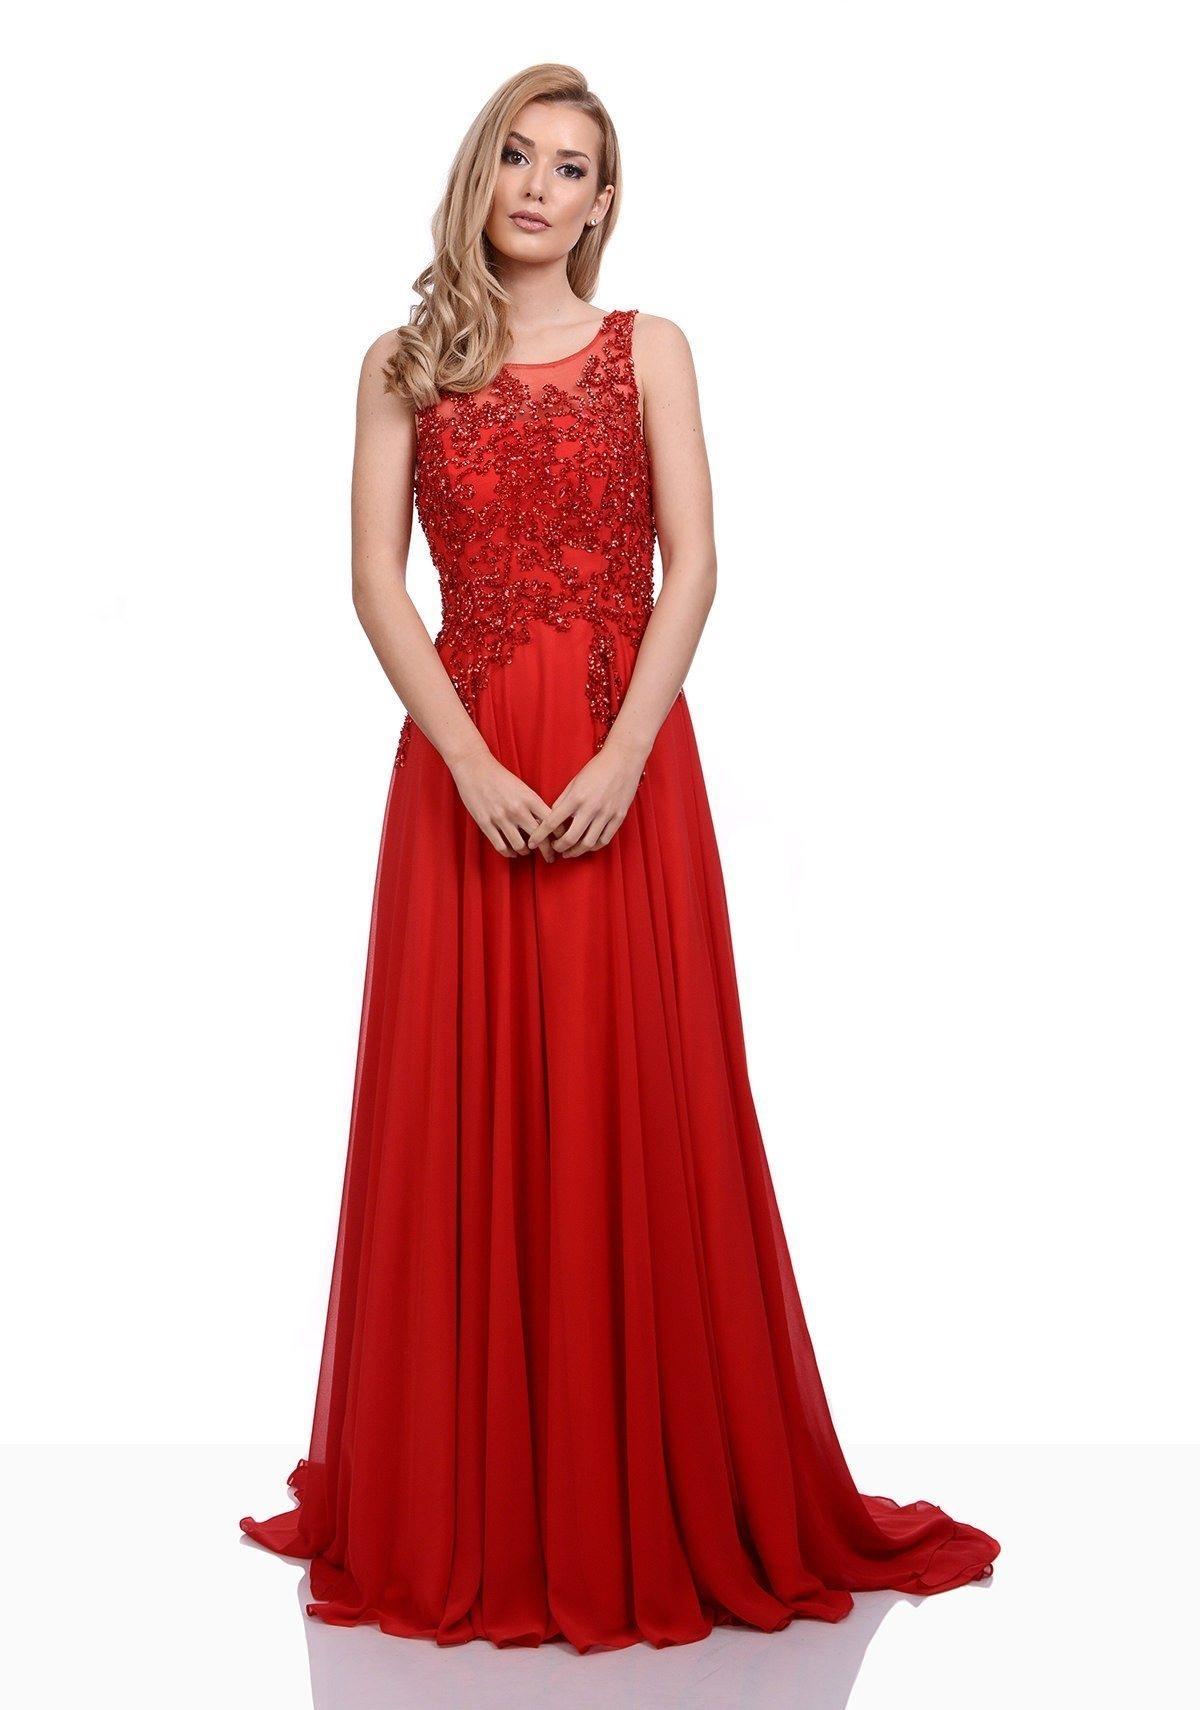 17 Perfekt Abiballkleider Lang Rot ÄrmelAbend Einfach Abiballkleider Lang Rot für 2019